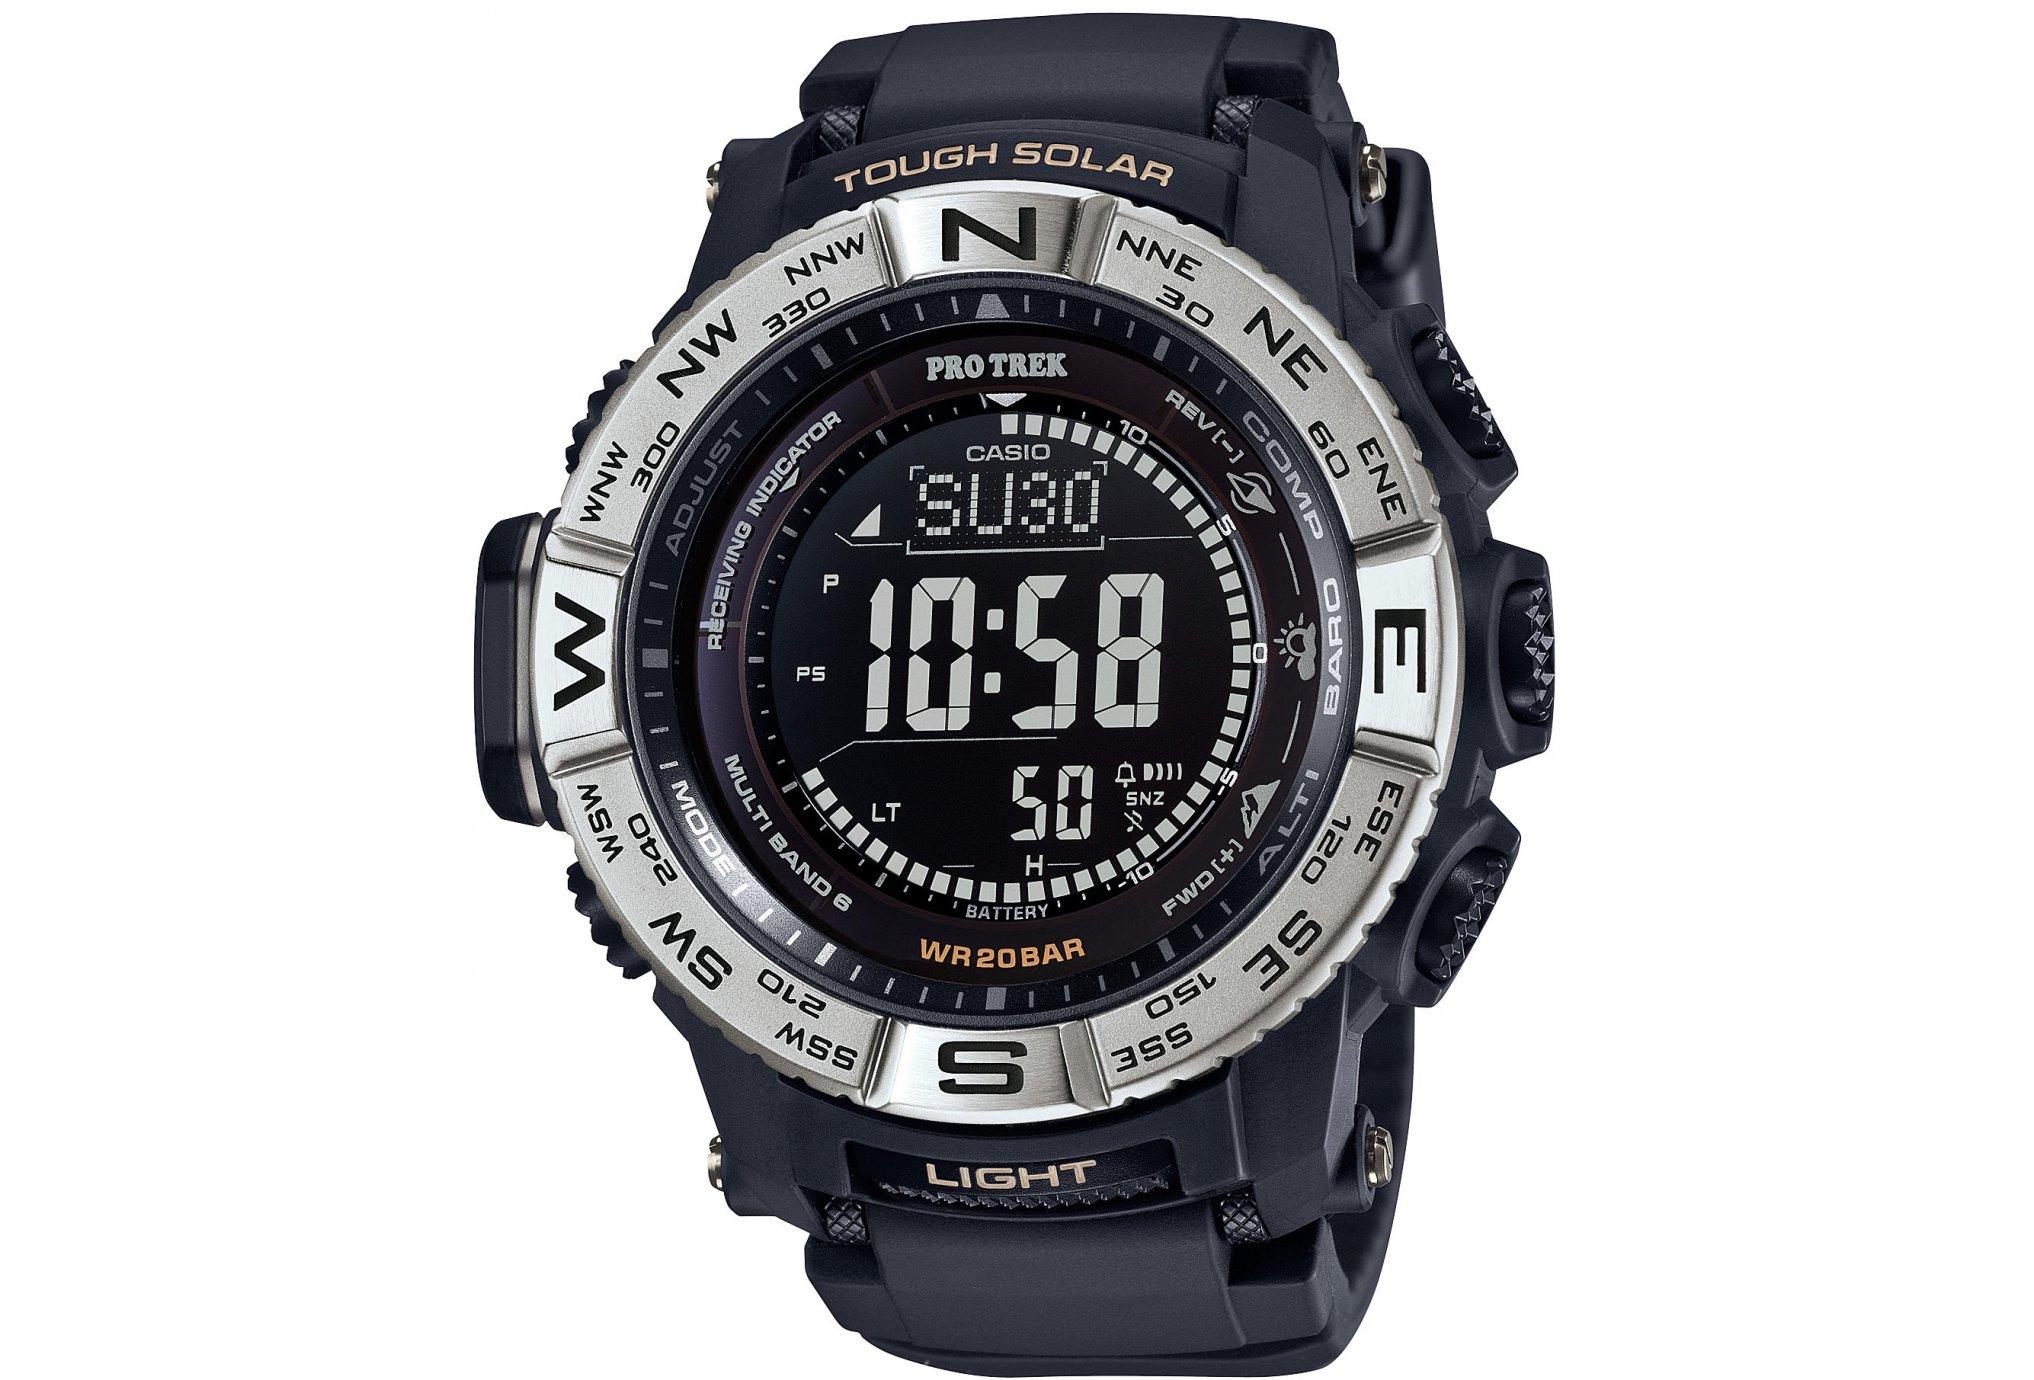 Casio Pro trek prw-3510 montres de sport